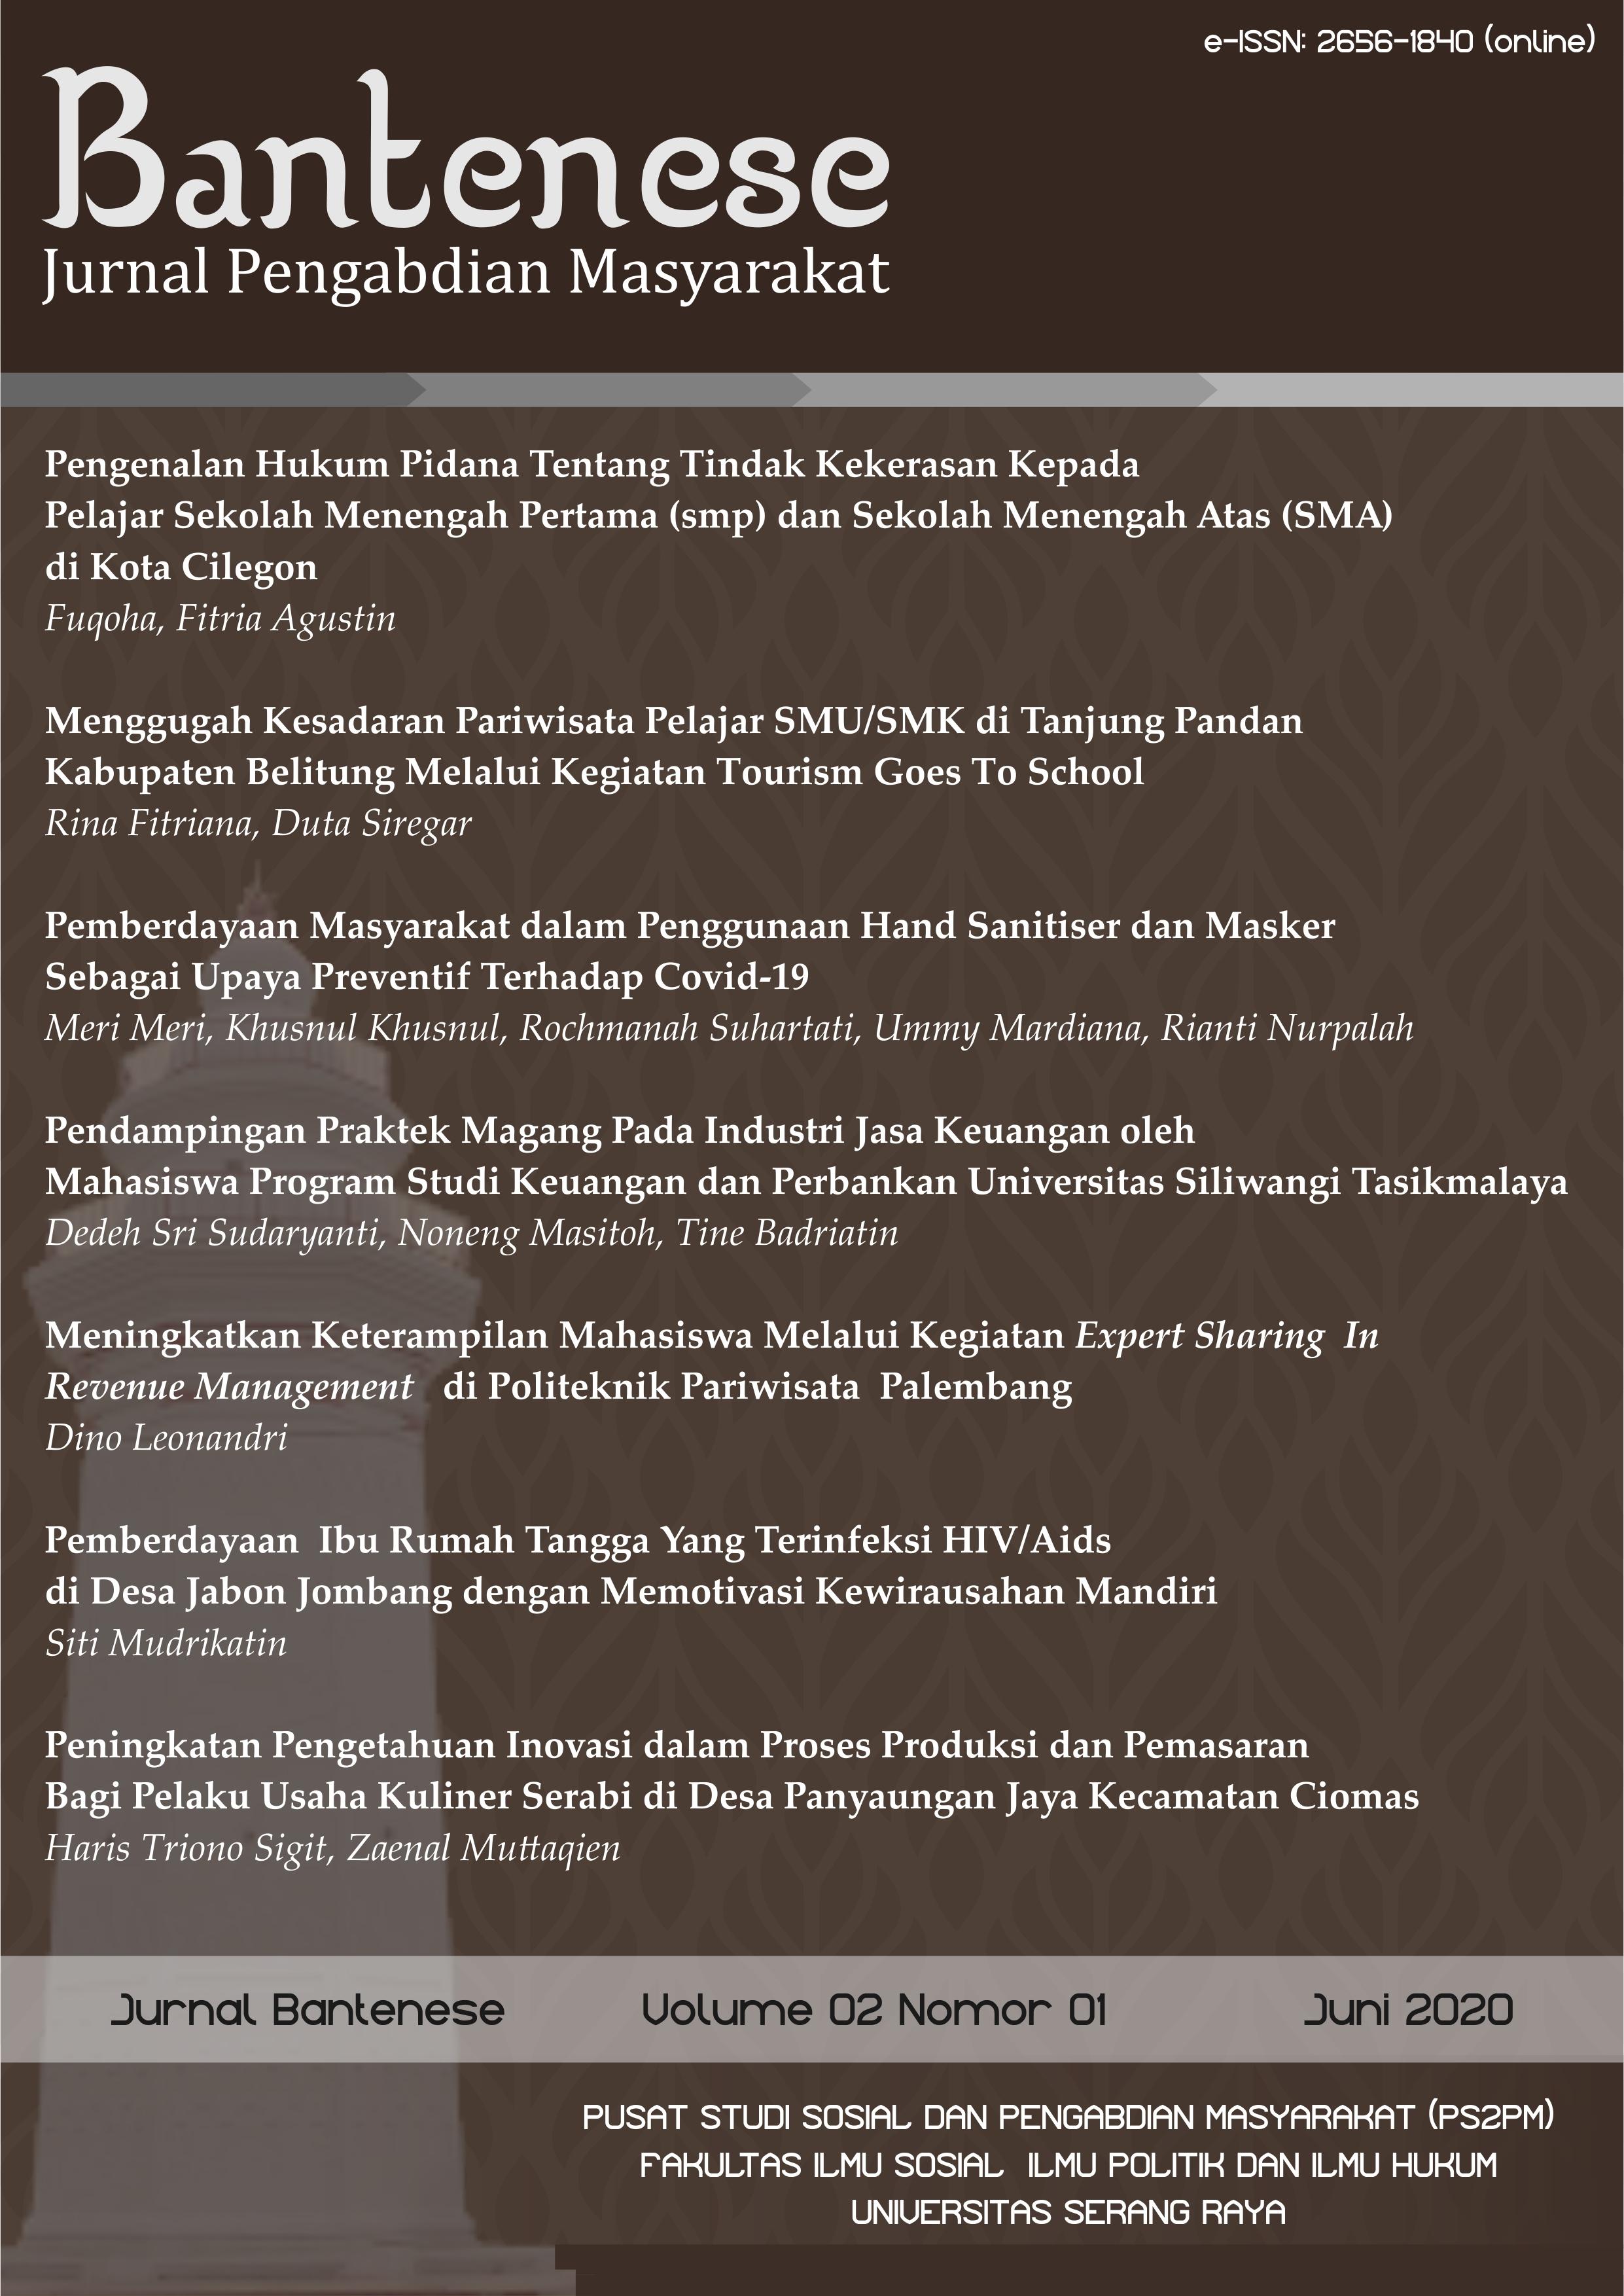 Pemberdayaan Masyarakat Dalam Penggunaan Hand Sanitizier Dan Masker Sebagai Upaya Preventif Terhadap Covid 19 Bantenese Jurnal Pengabdian Masyarakat